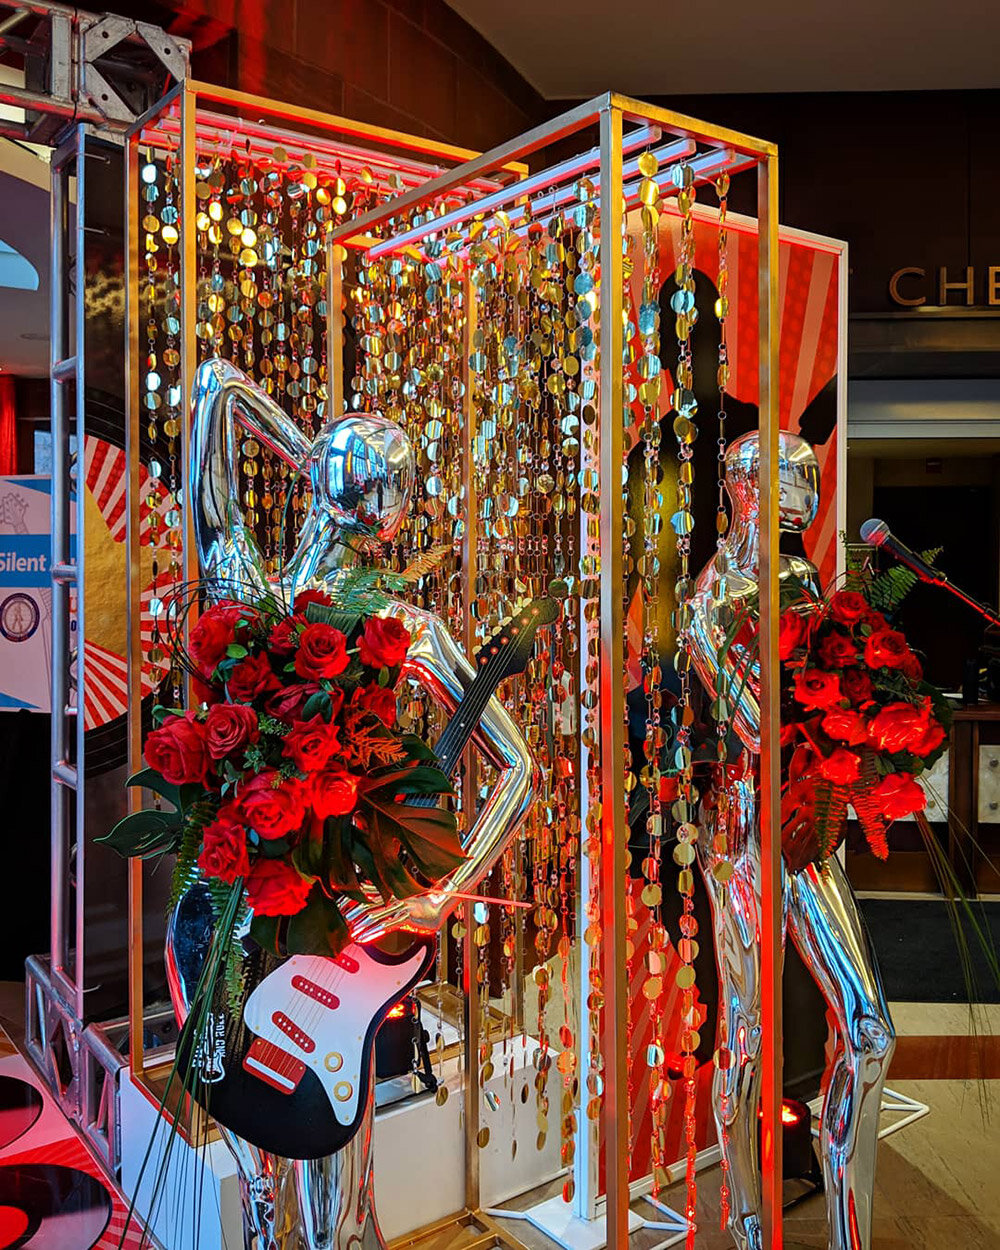 Paras-Events-Gala-Design-Rock-&-Roll-Hall-of-Fame-William-Osler-Health-System-Foundation-Rose-Theatre-Brampton-1.jpg